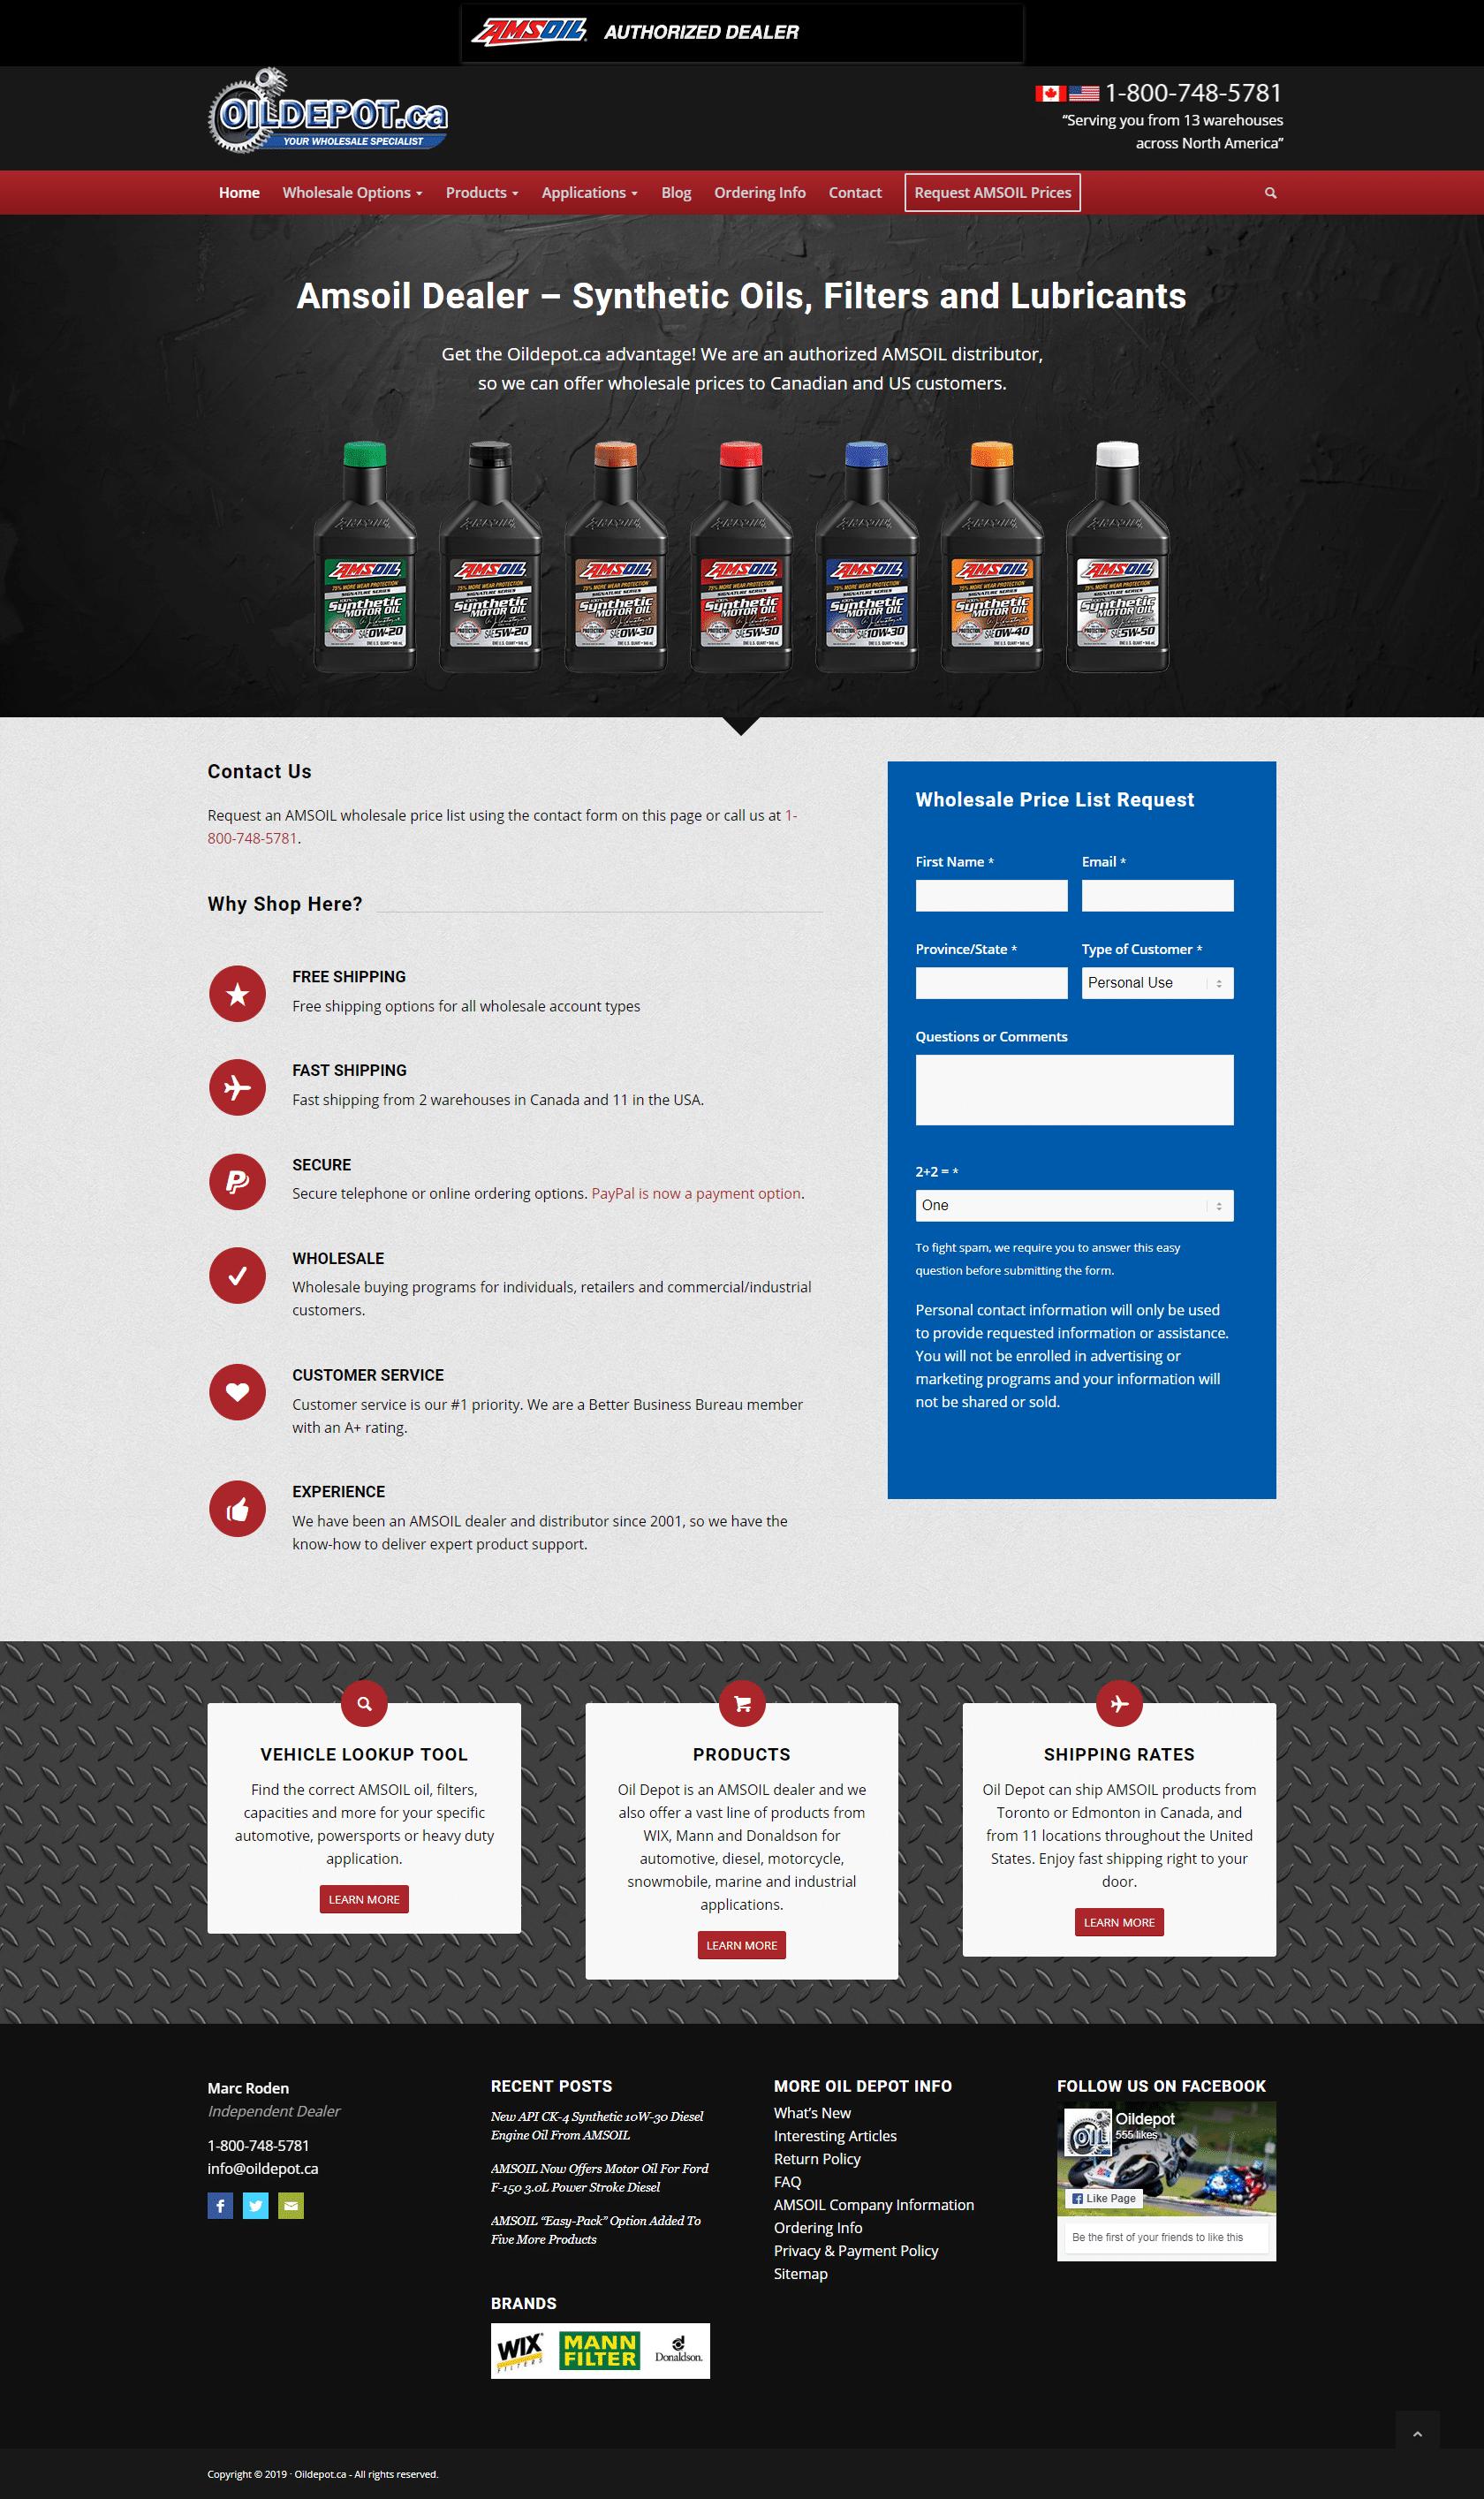 Oil Depot website design layout